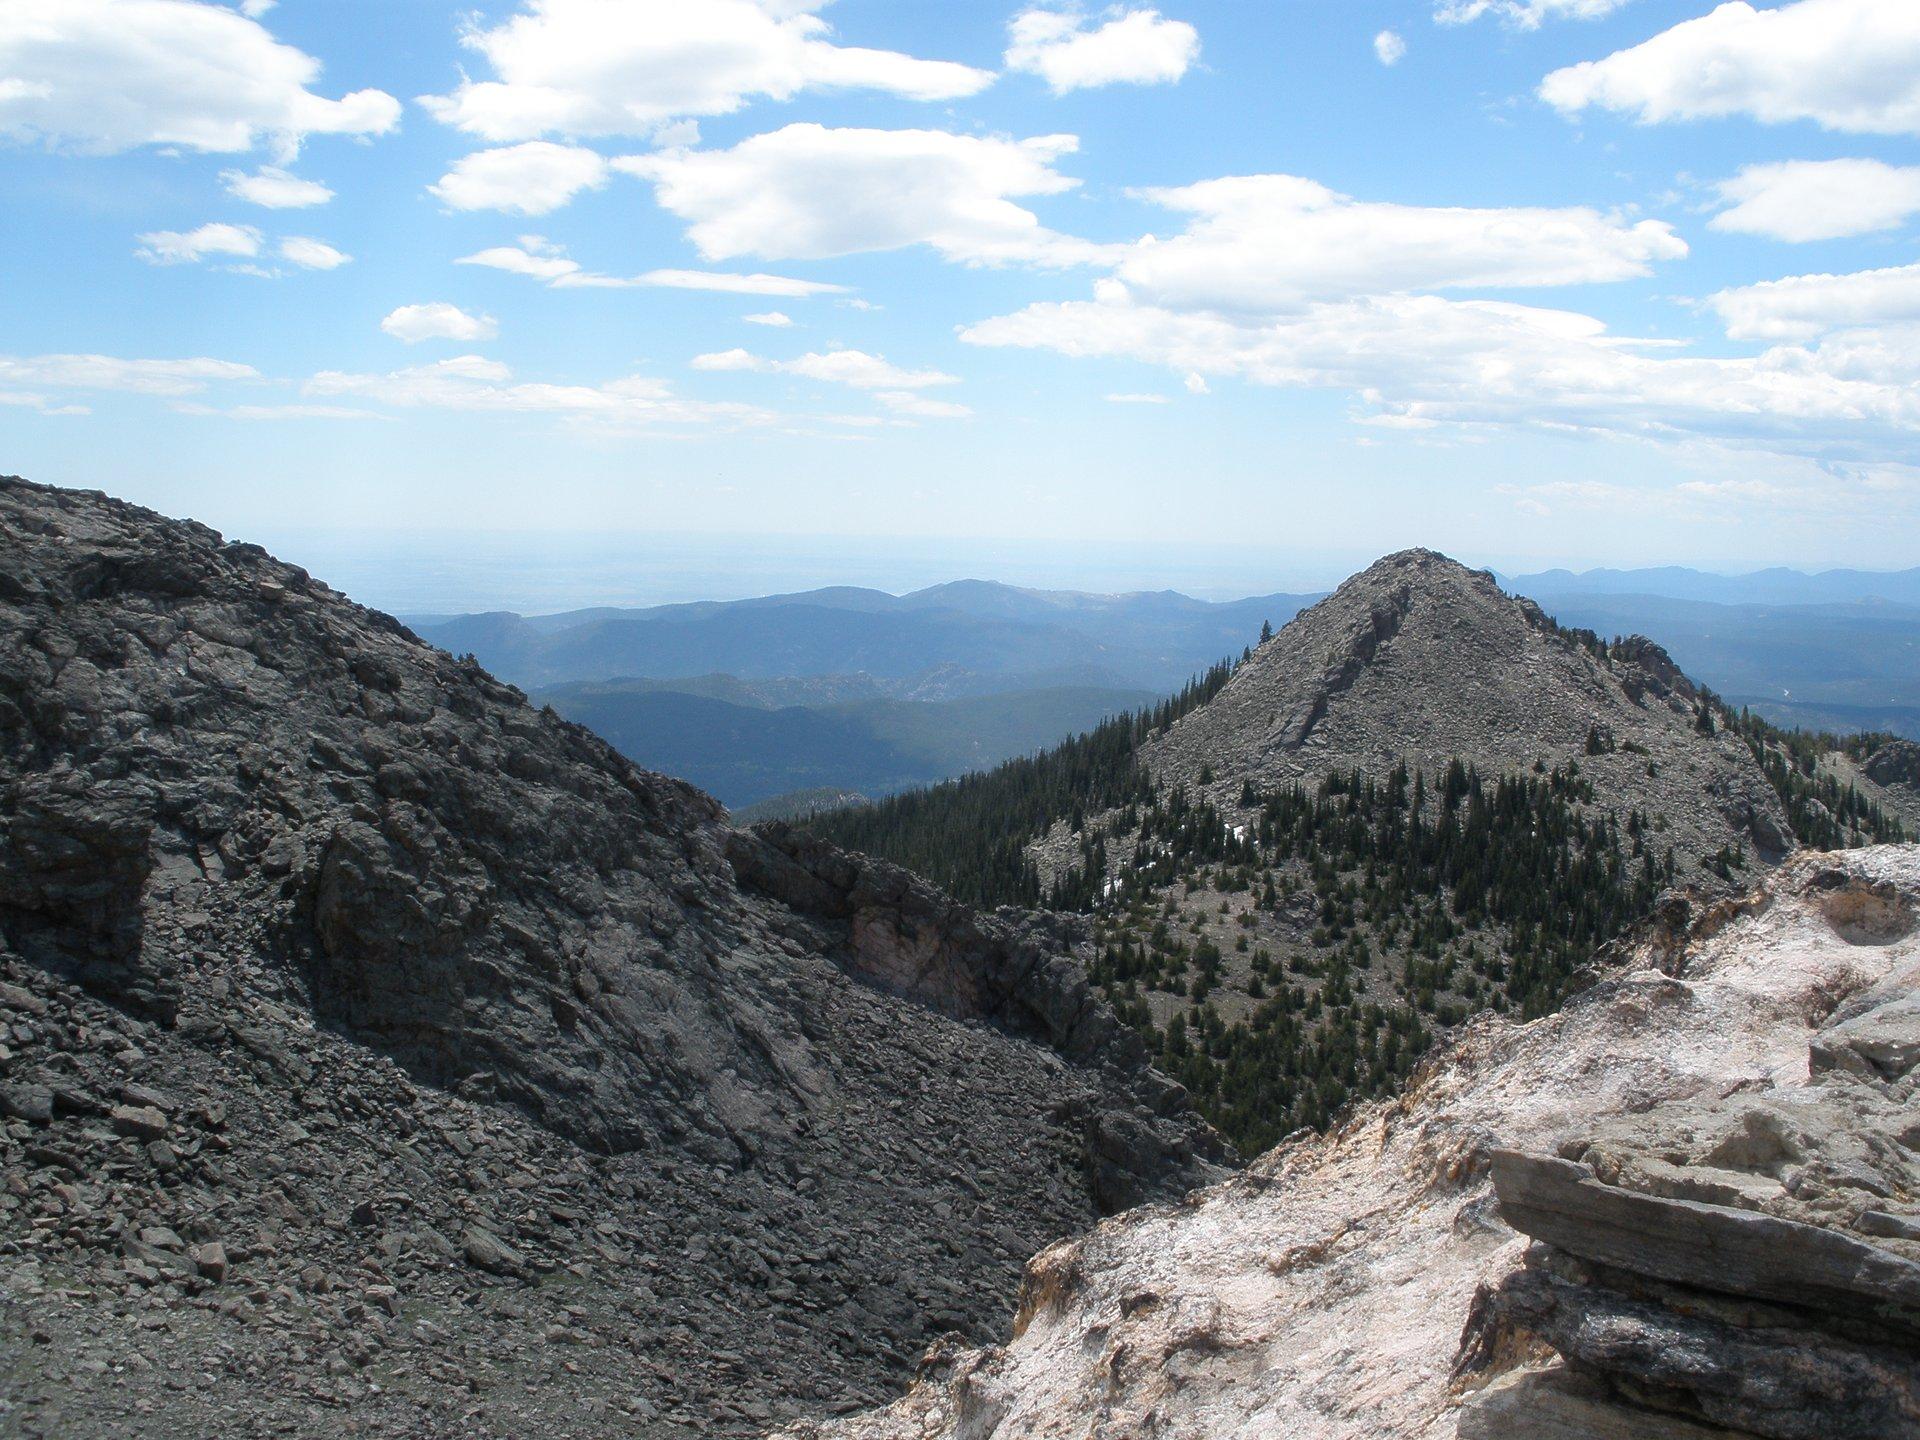 Twin Sisters Hike in Colorado - Best Season 2020